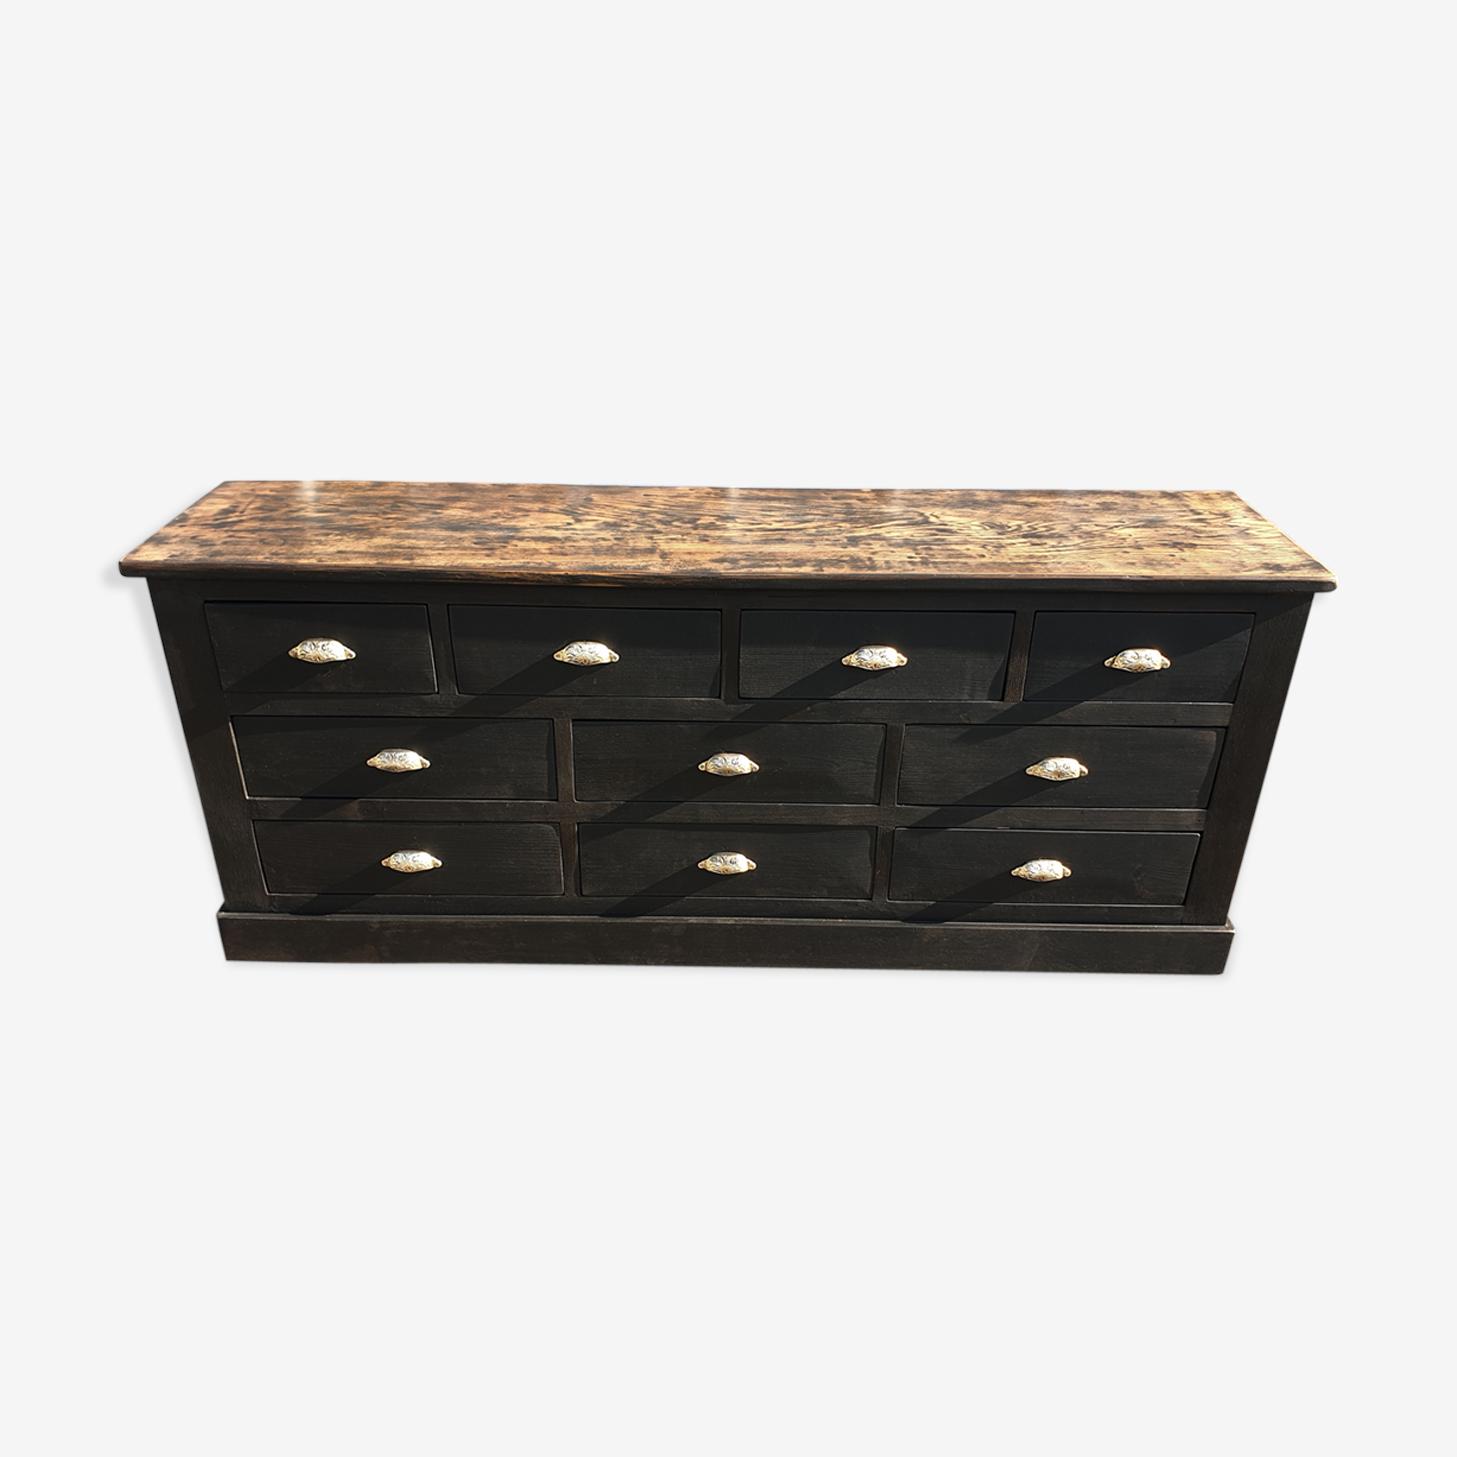 Cabinet 10 drawers black patina